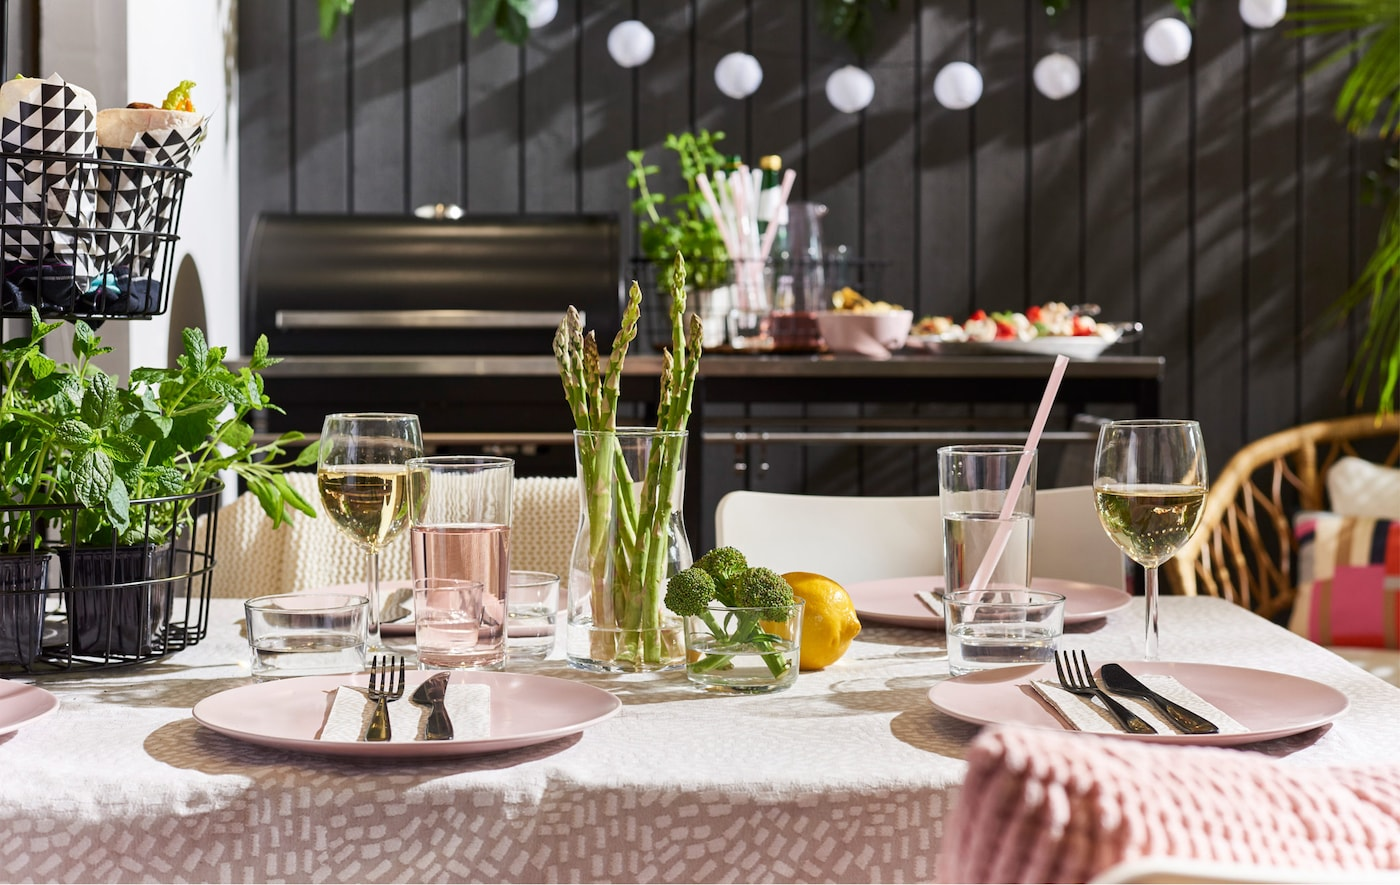 gartenparty organisieren tipps ikea ikea. Black Bedroom Furniture Sets. Home Design Ideas